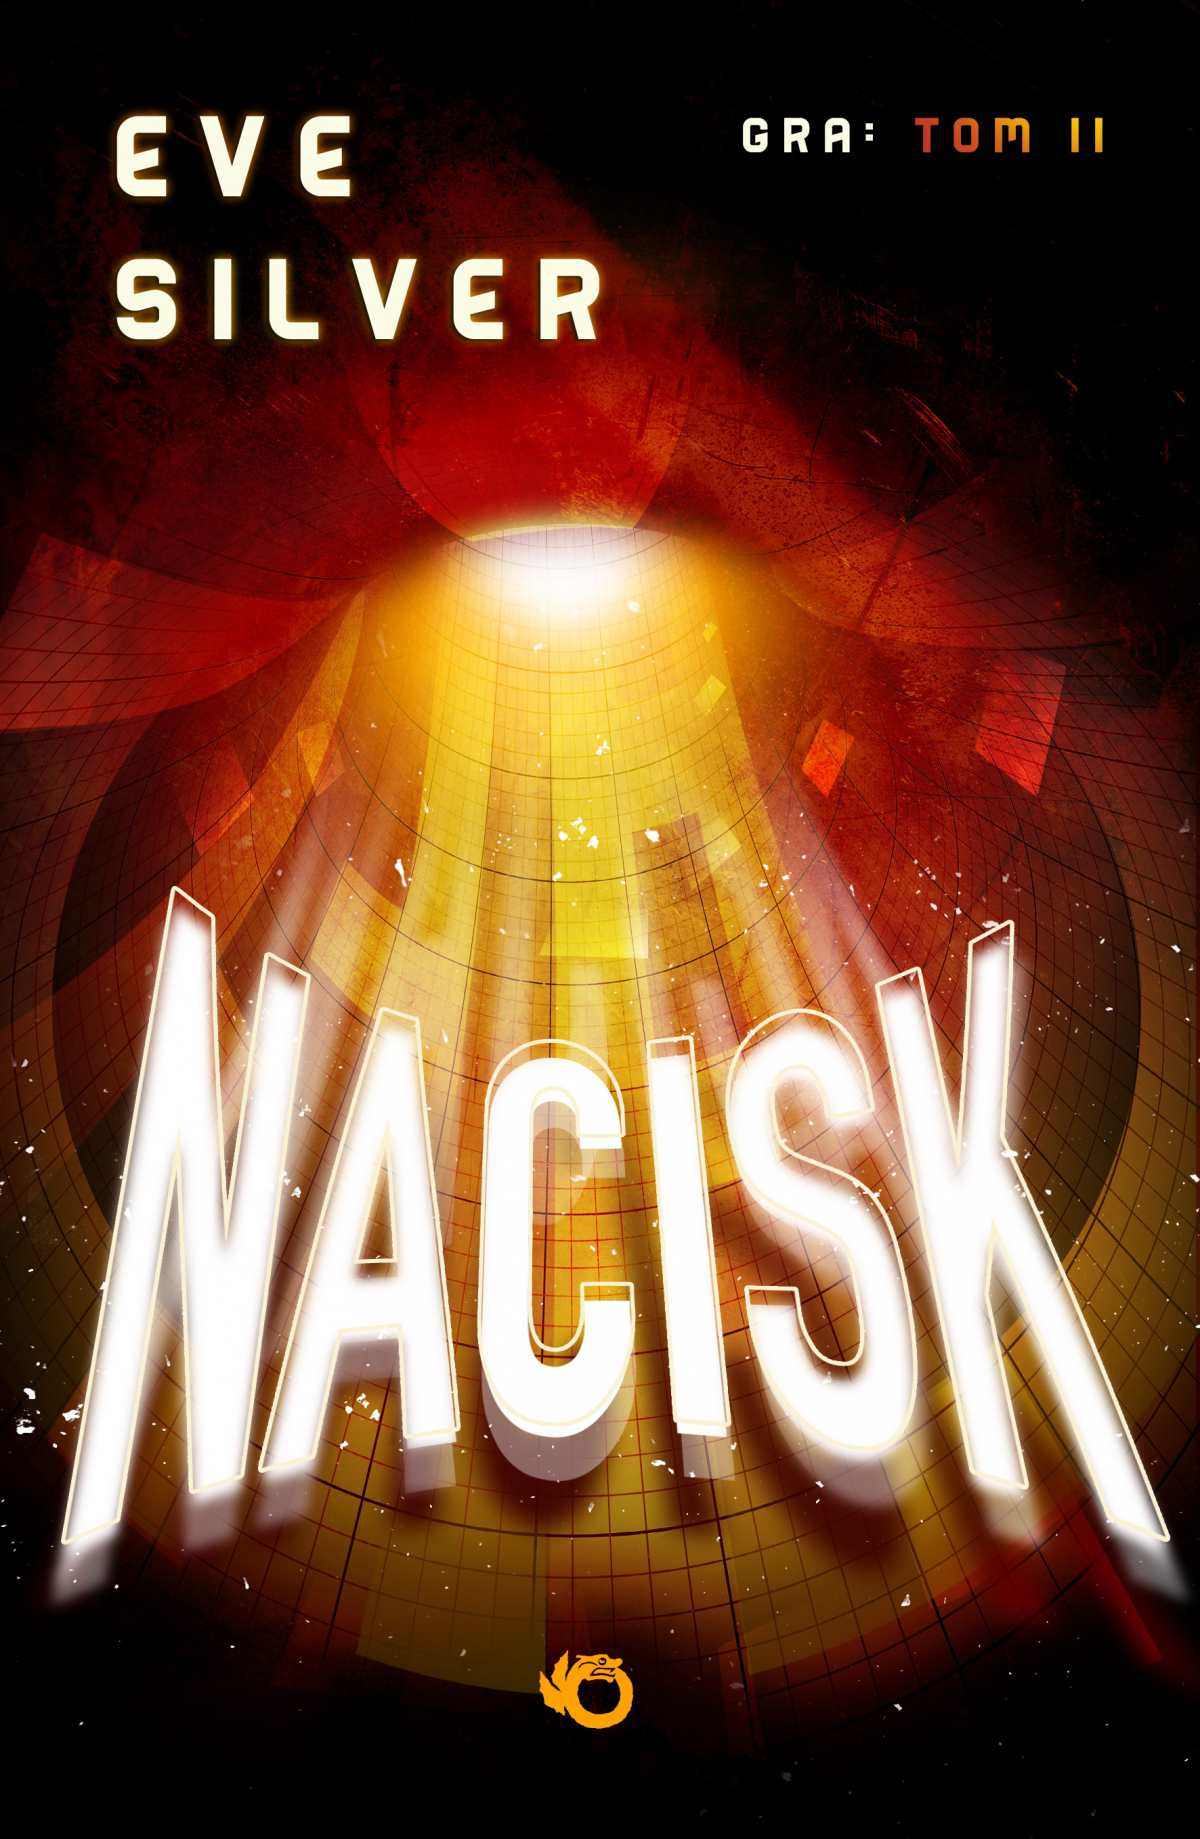 Gra. Tom 2. Nacisk - Ebook (Książka EPUB) do pobrania w formacie EPUB